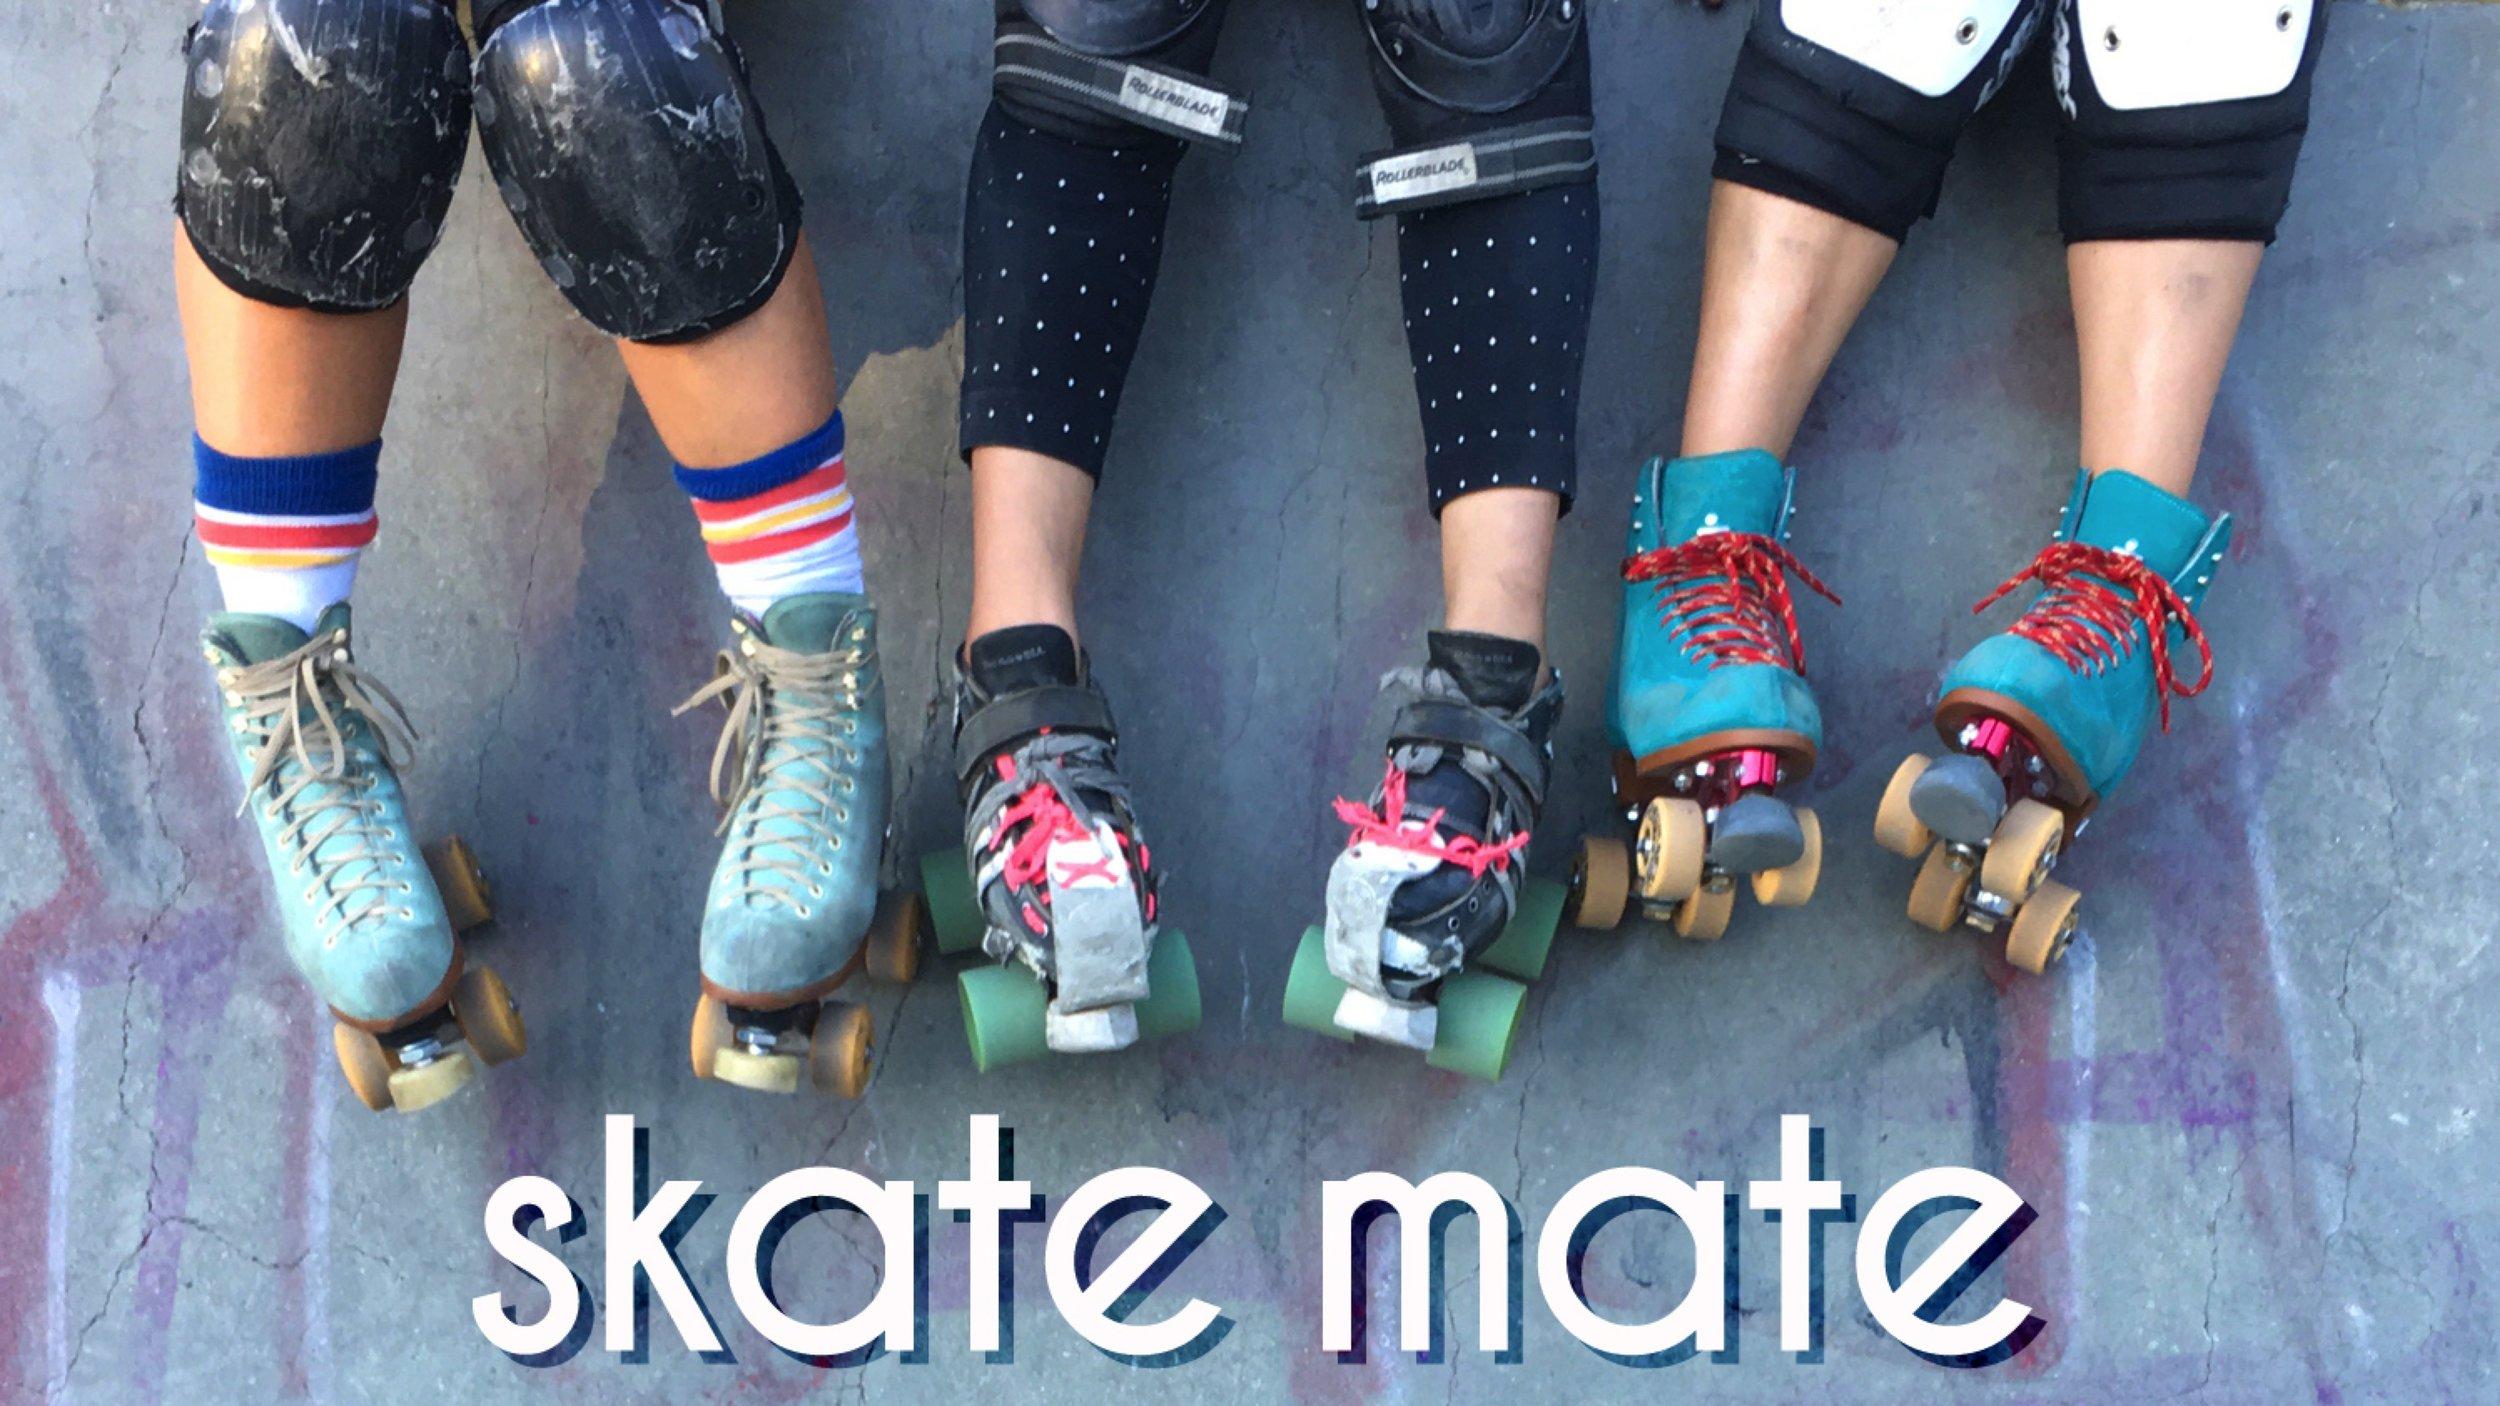 171118-Skate Mate -Jill Daisy -FINAL_Page_01.jpg